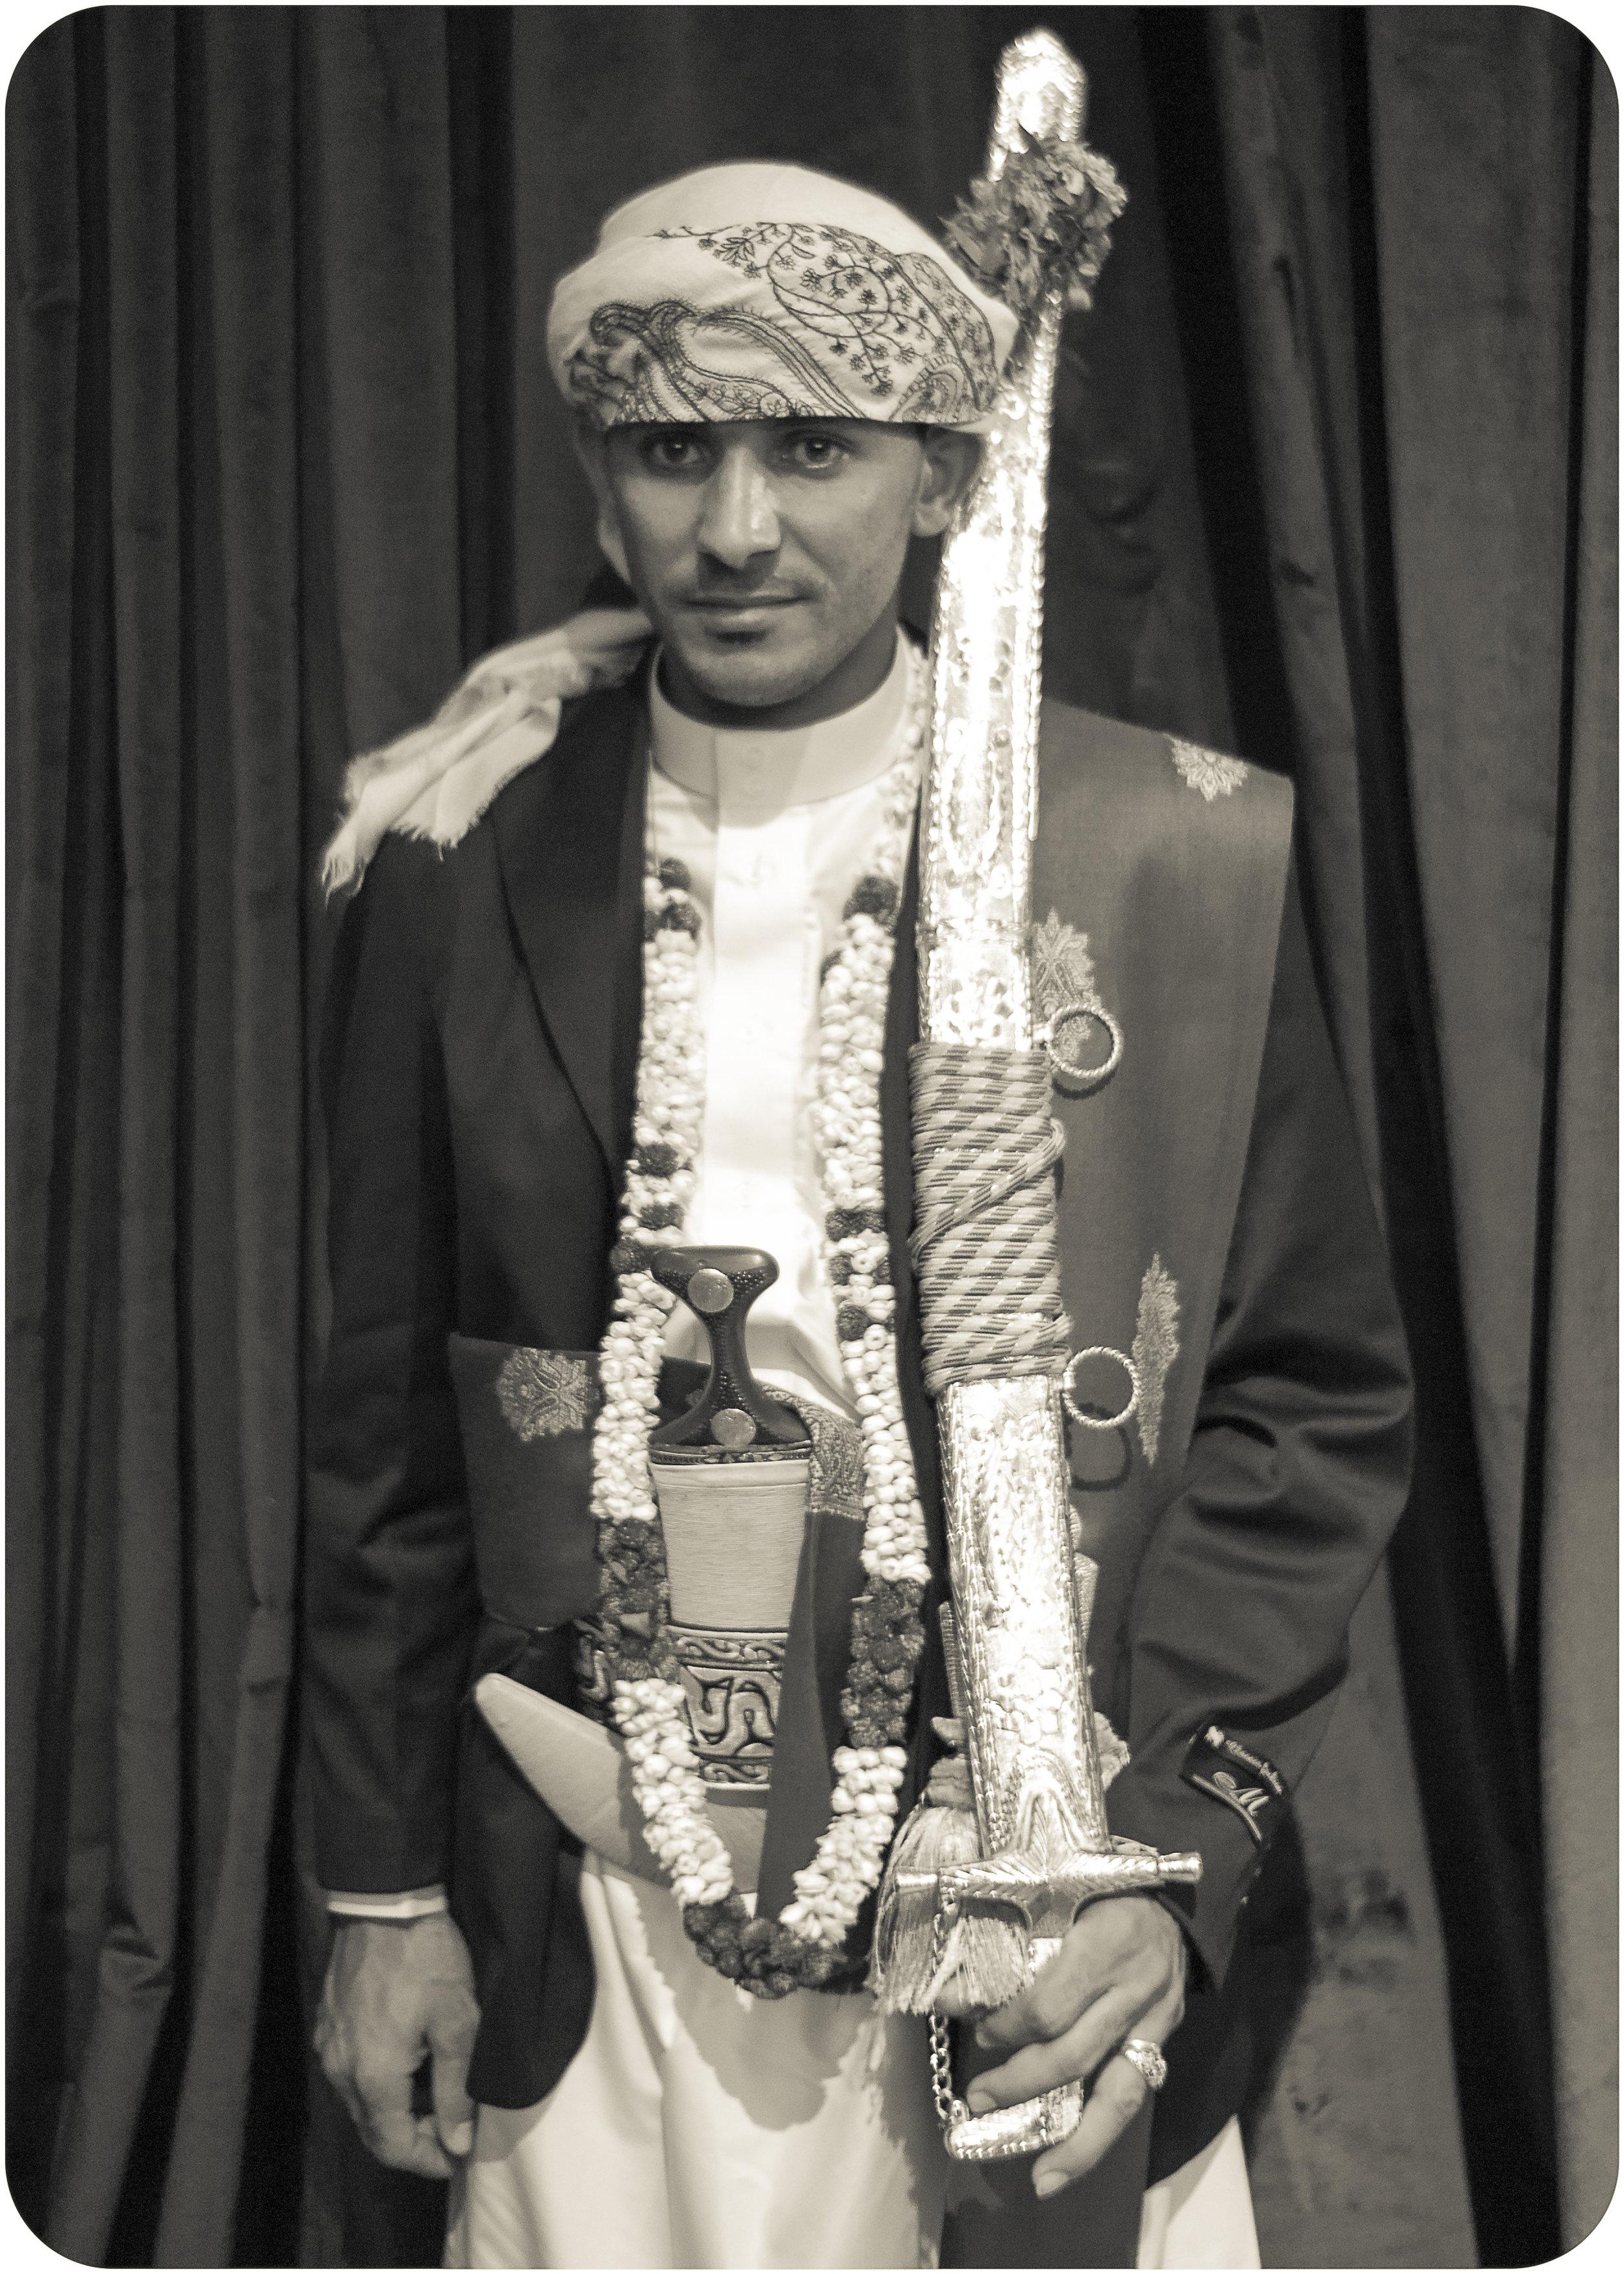 Abdallah Saif